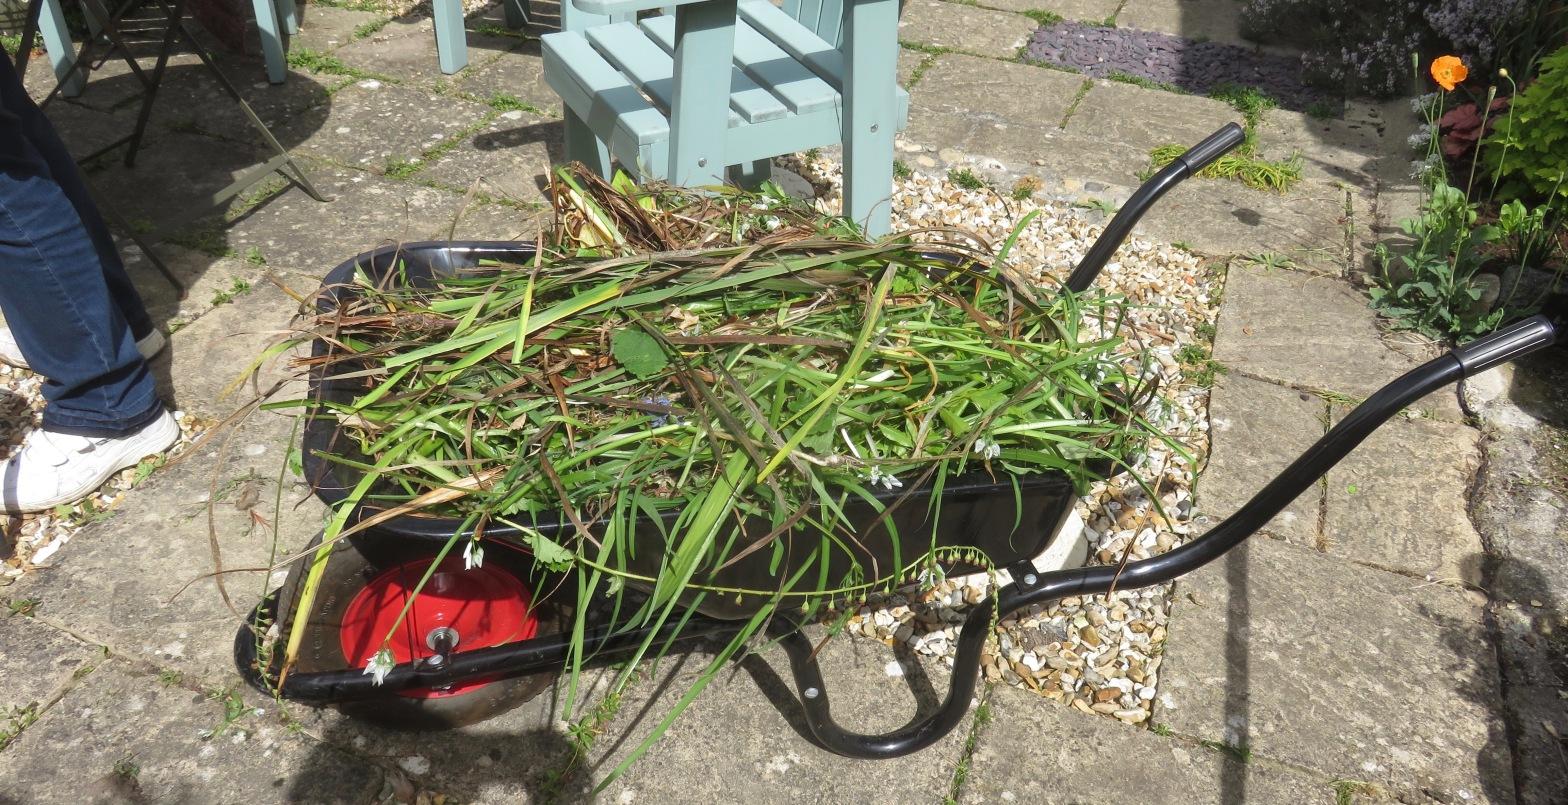 Wheelbarrow loaded with weeds